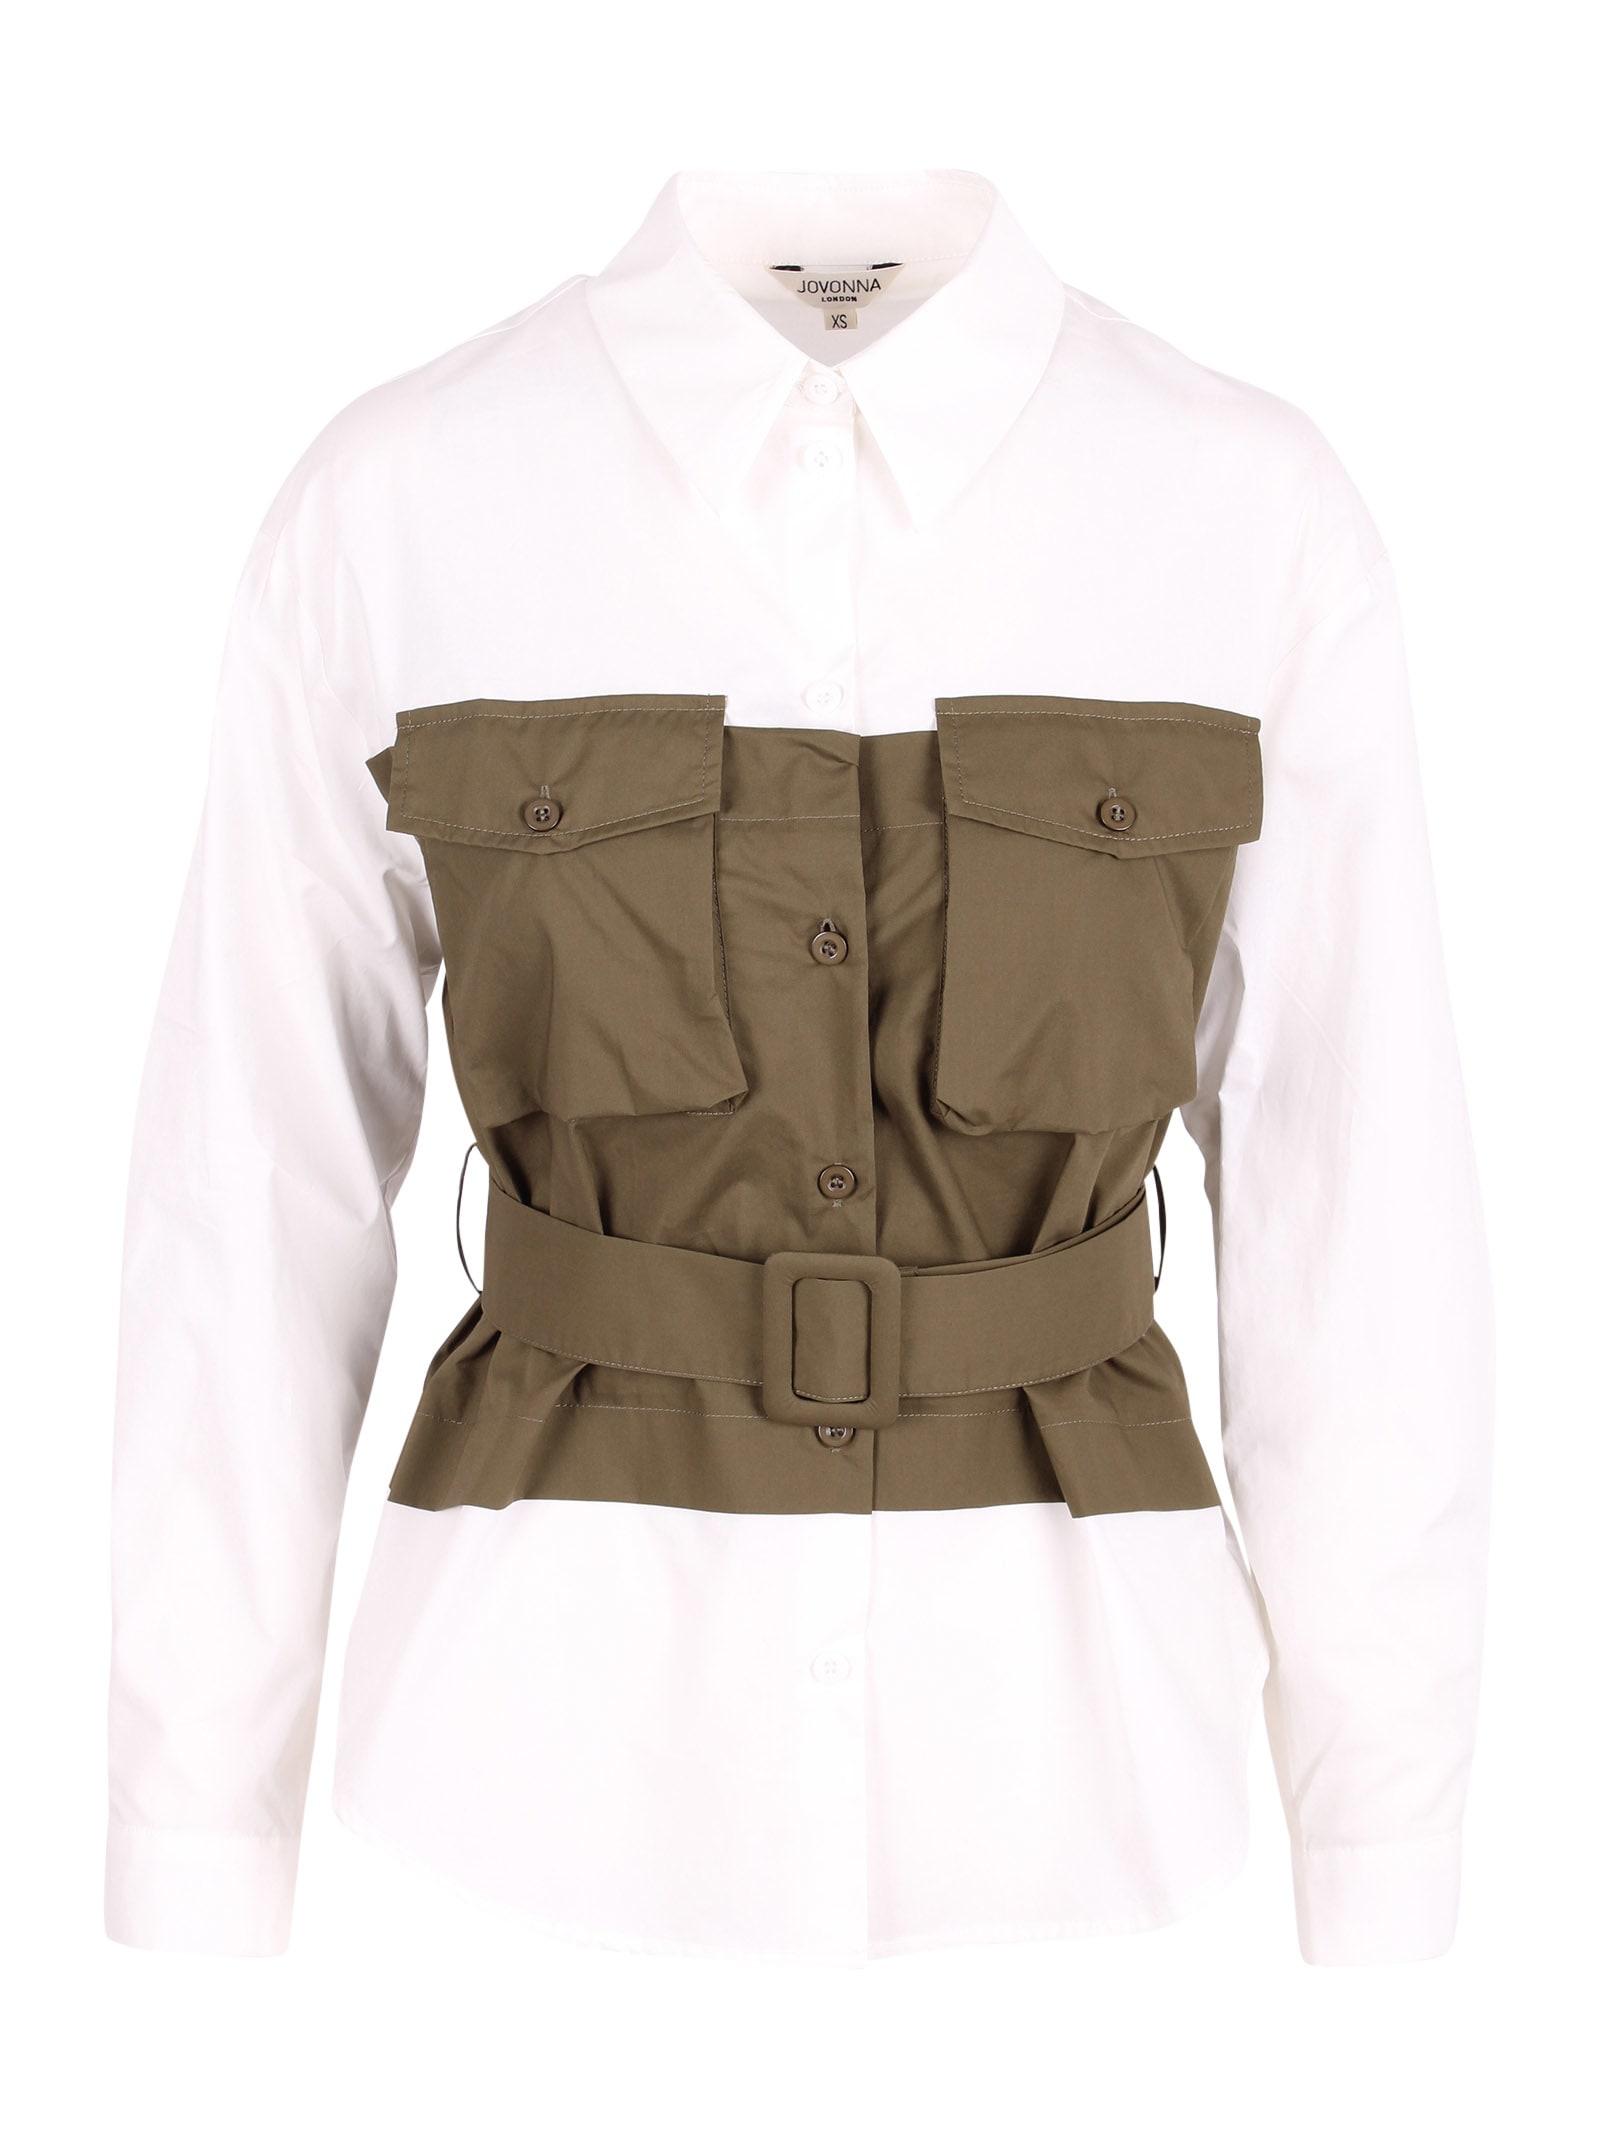 London esther Cotton Shirt